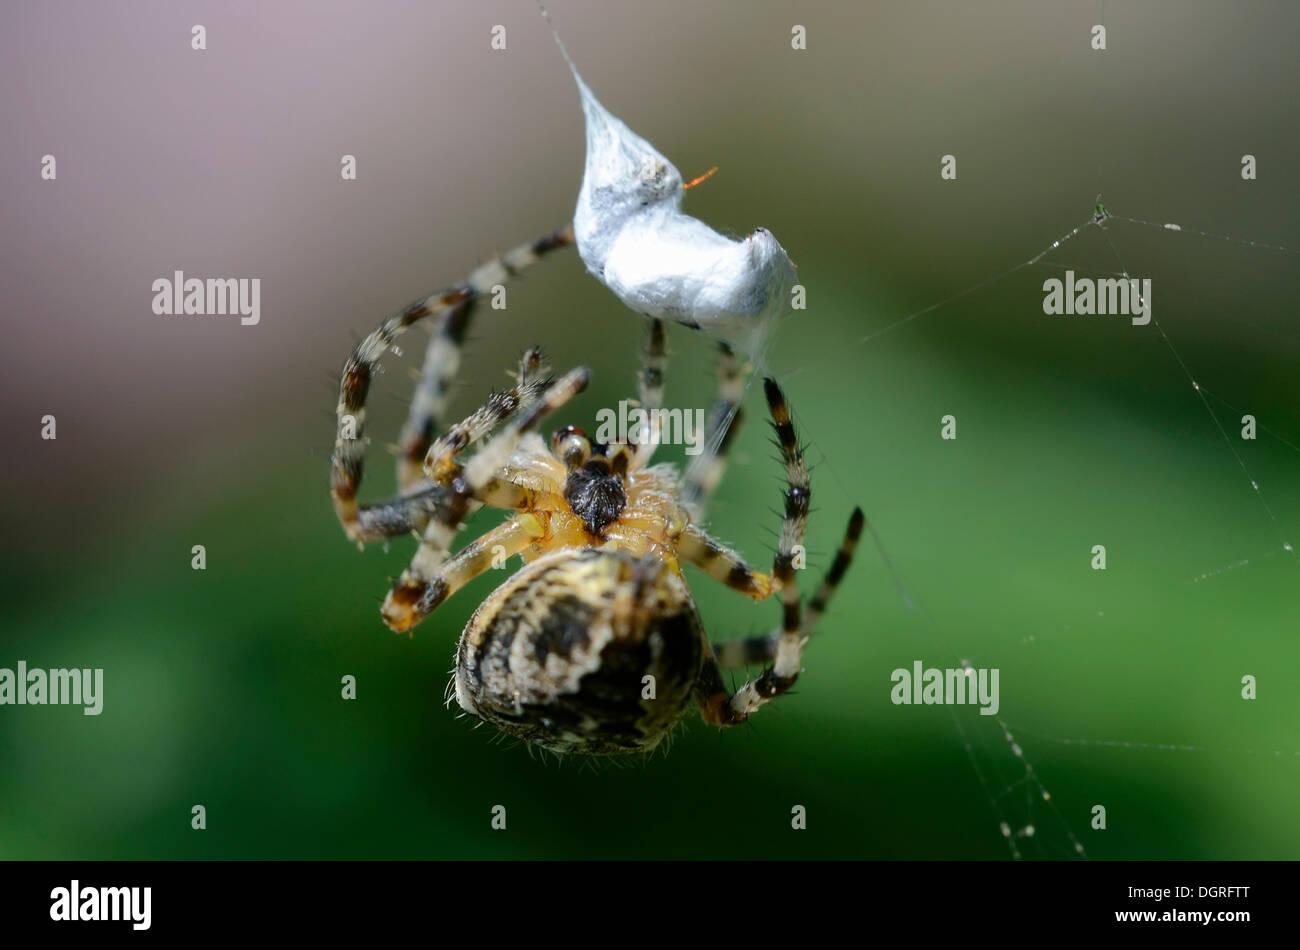 Garden Spider or Cross Orbweaver (Araneus diadematus) packing its prey, near Lassahn, Schaal Lake region - Stock Image